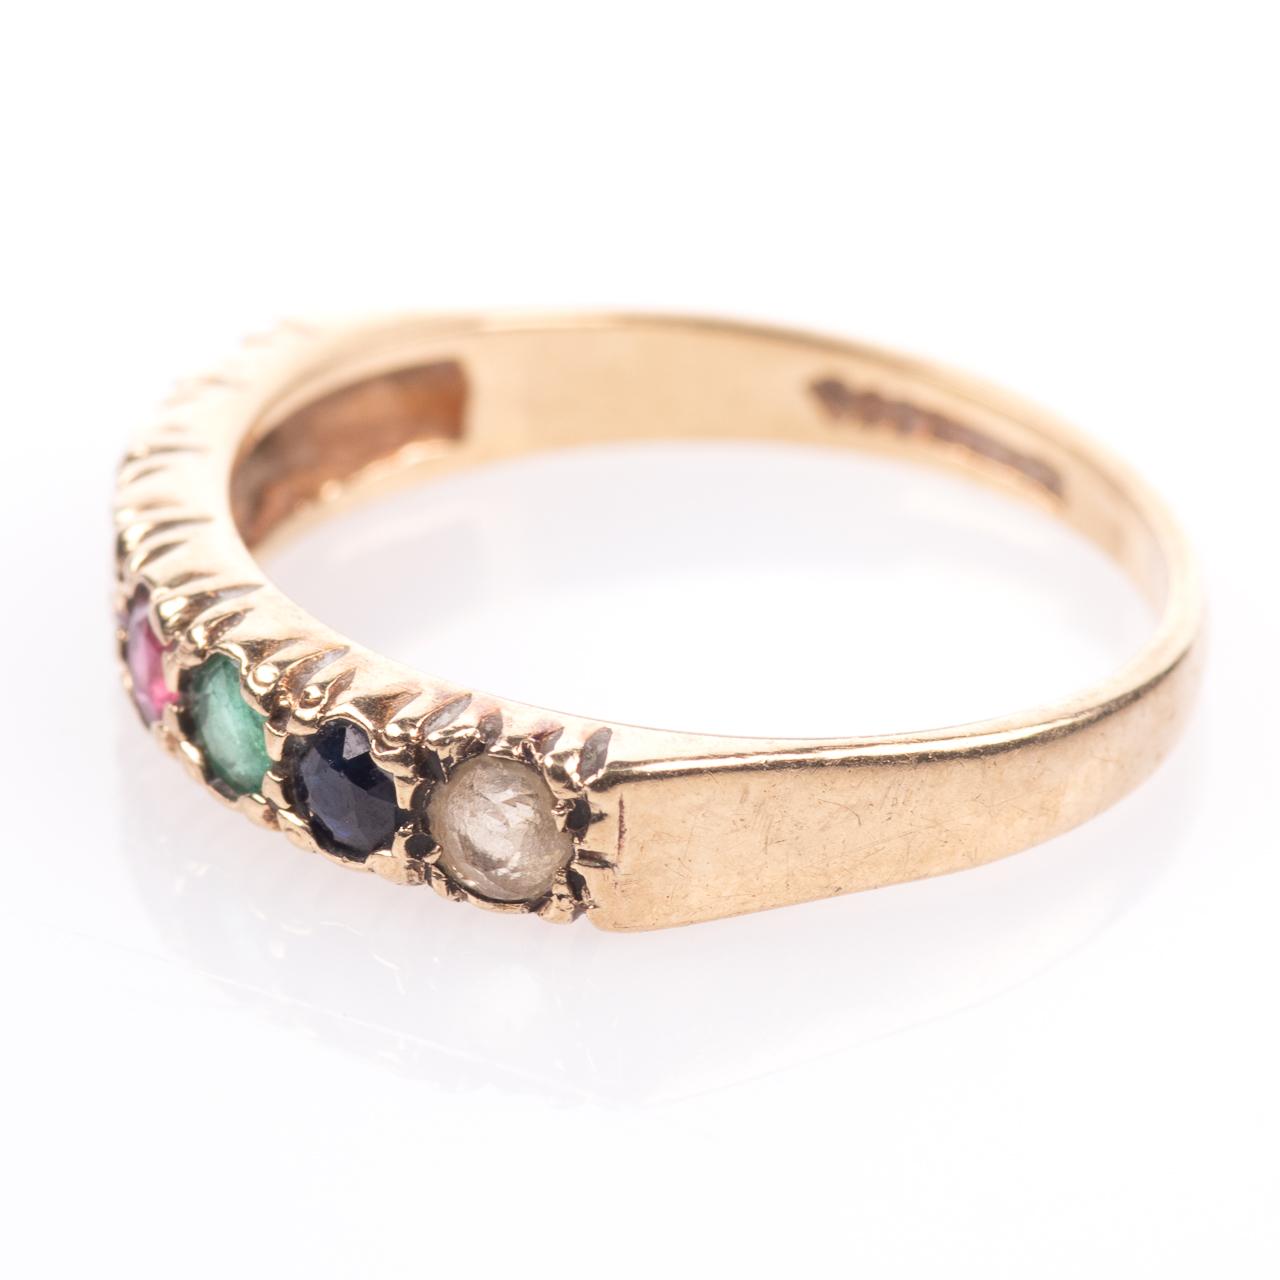 9ct Gold Emerald, Ruby, Amethyst, Sapphire & Diamond Ring - Image 5 of 8